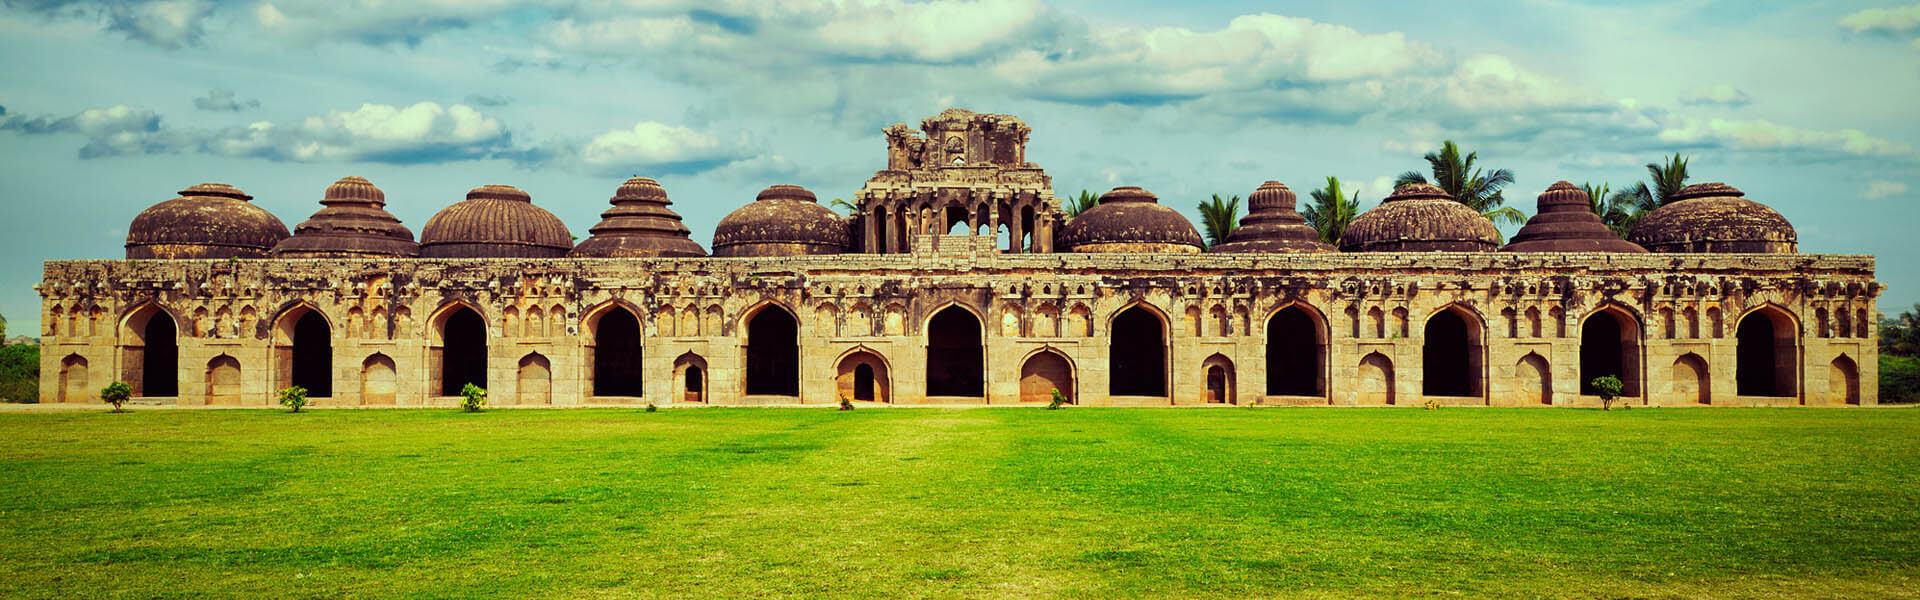 Deccan Odyssey Maharashtra Splendor